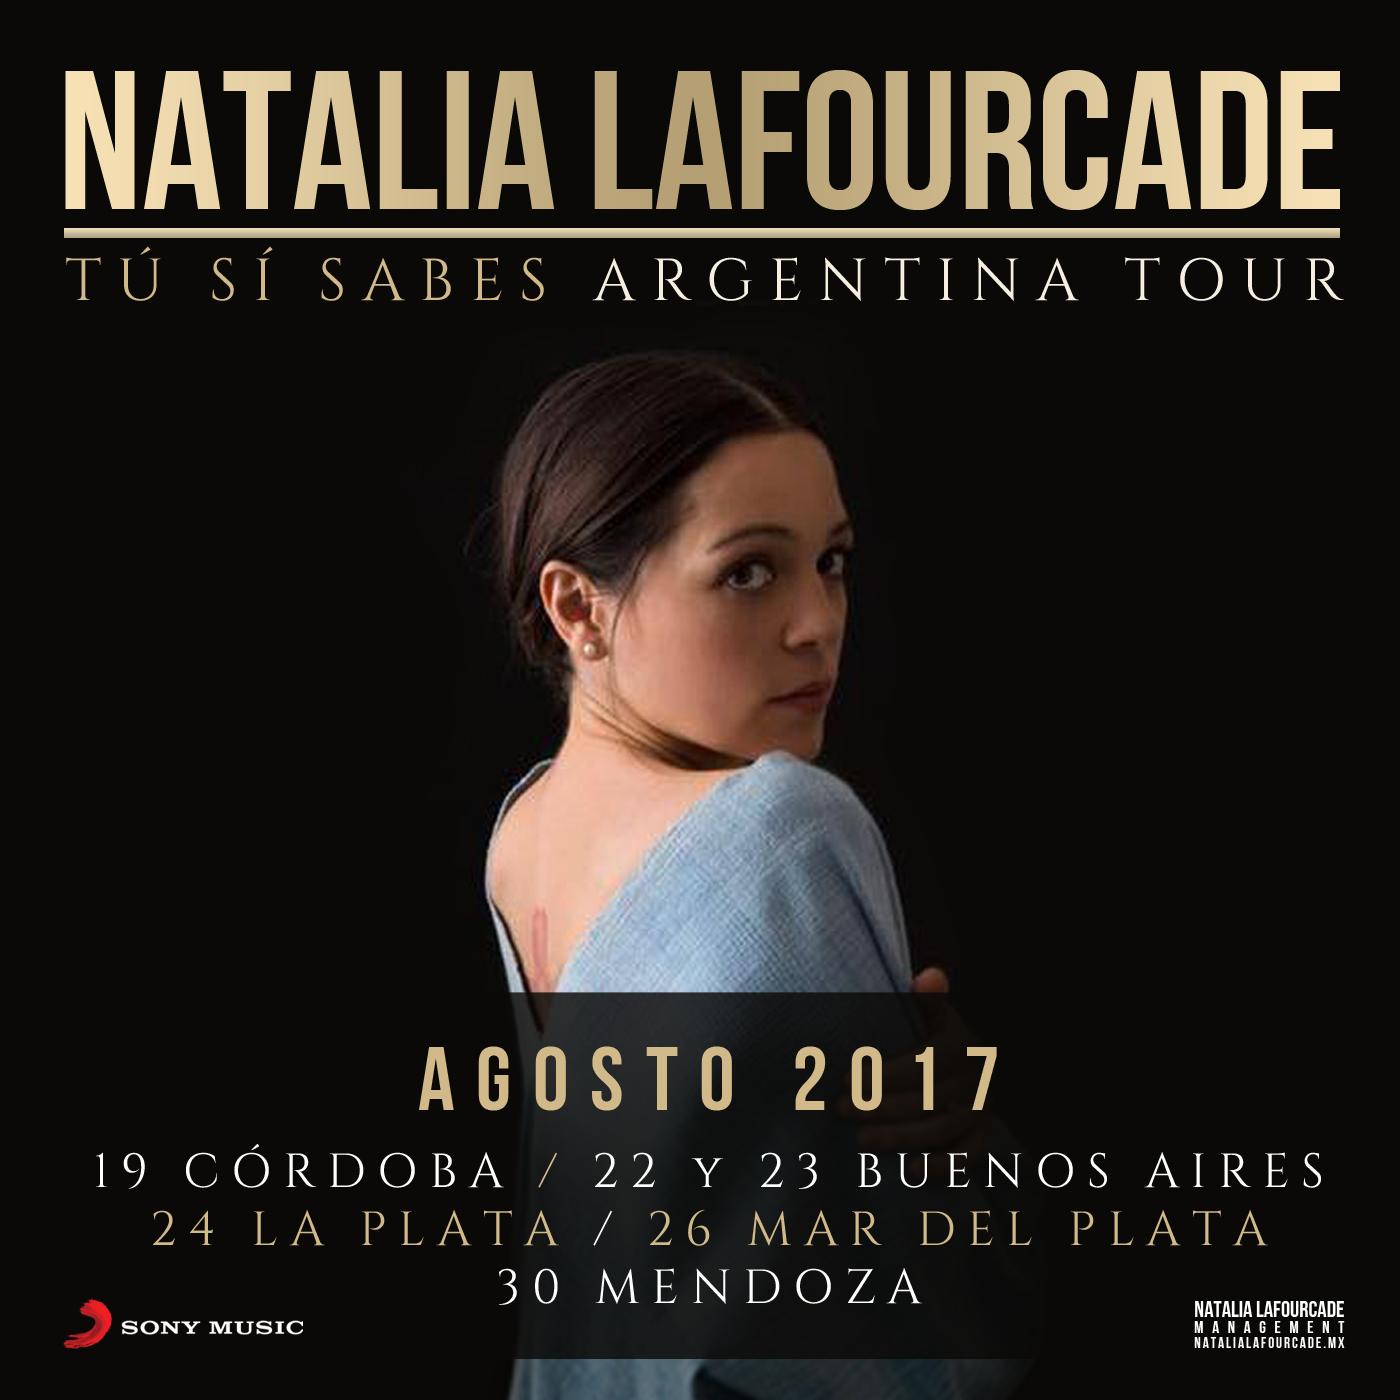 Argentina 2017 - New 2 Natalia Lafourcade